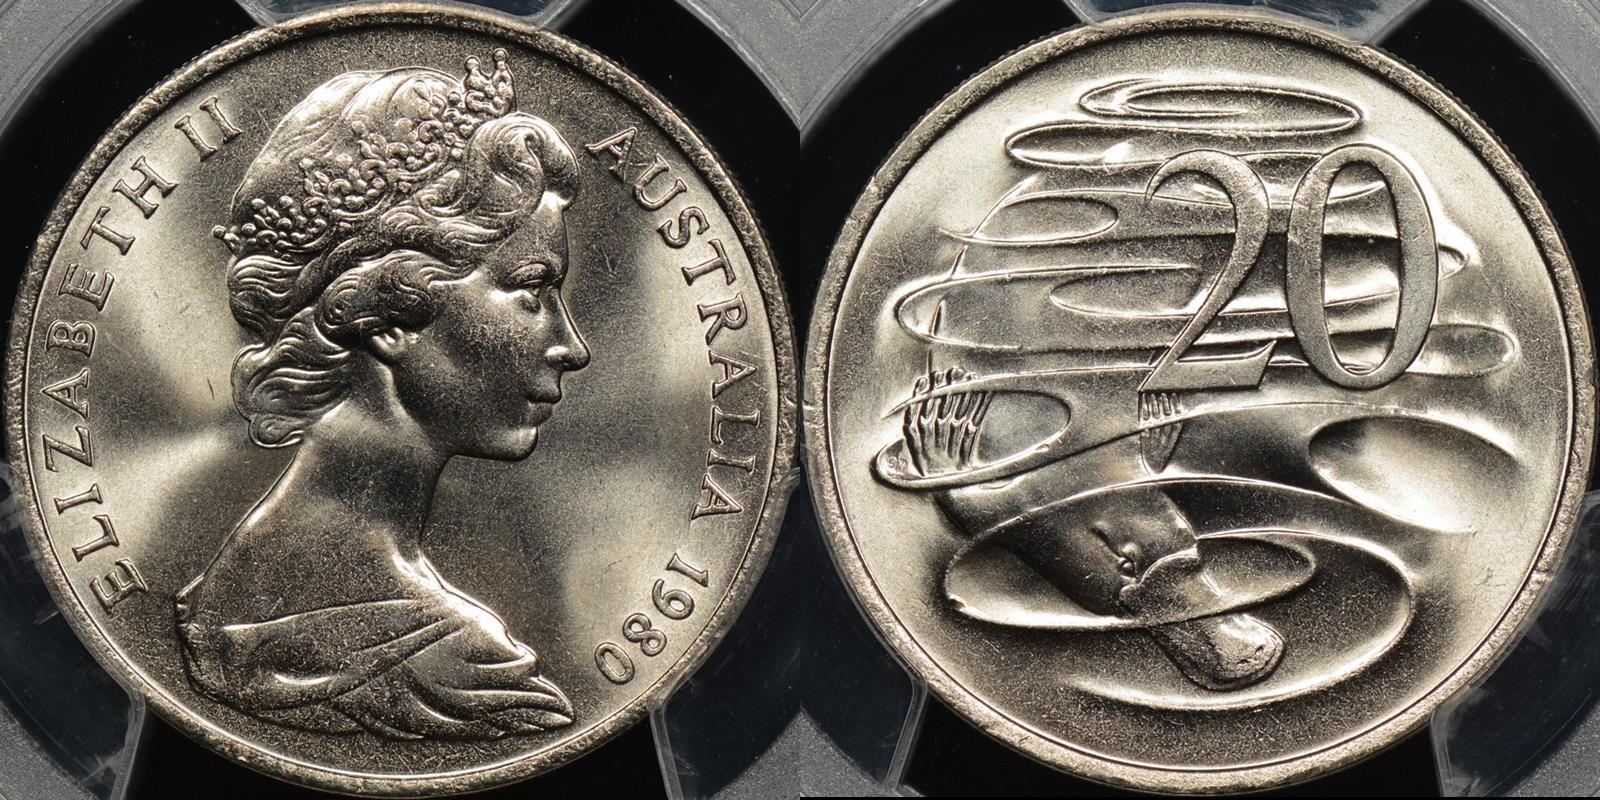 Australia 1980 20 cent GEM Uncirculated PCGS MS66